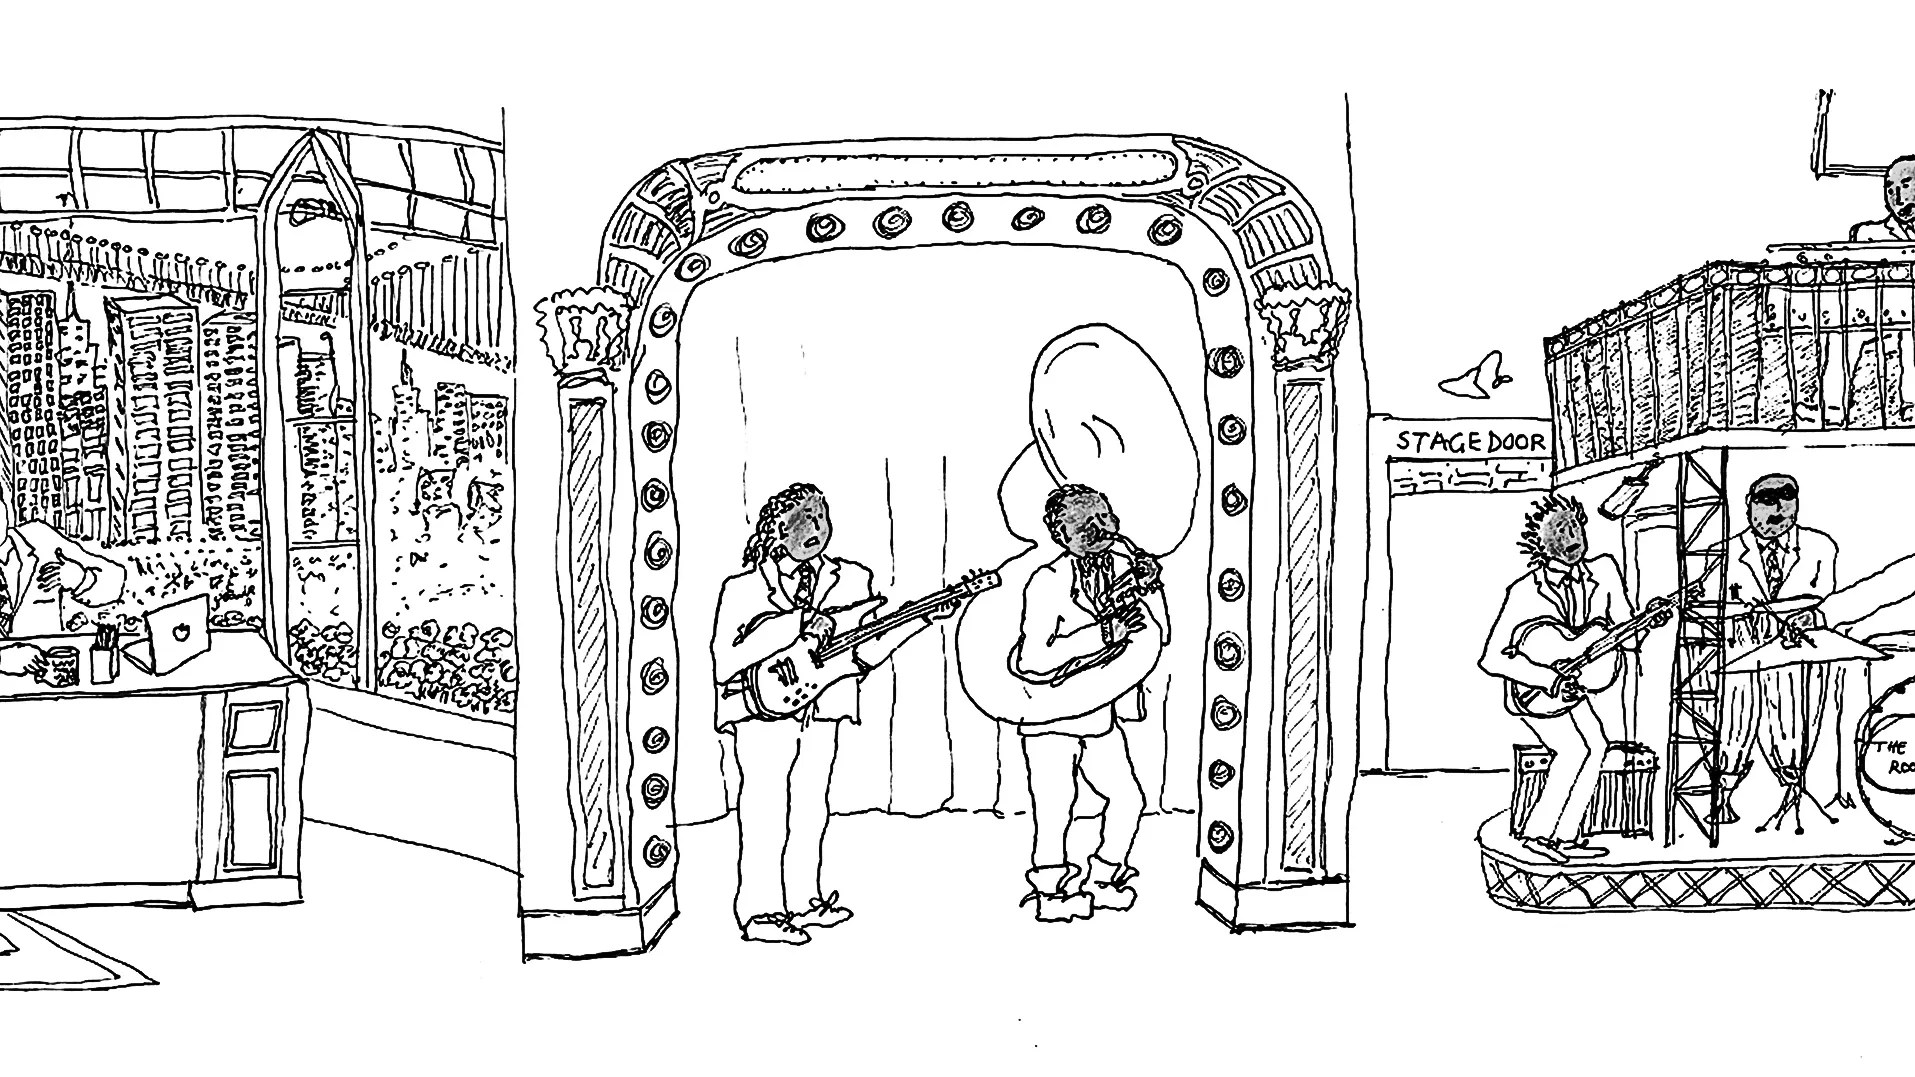 Graceful Appearance: Grace Coddington's Sketch for Late